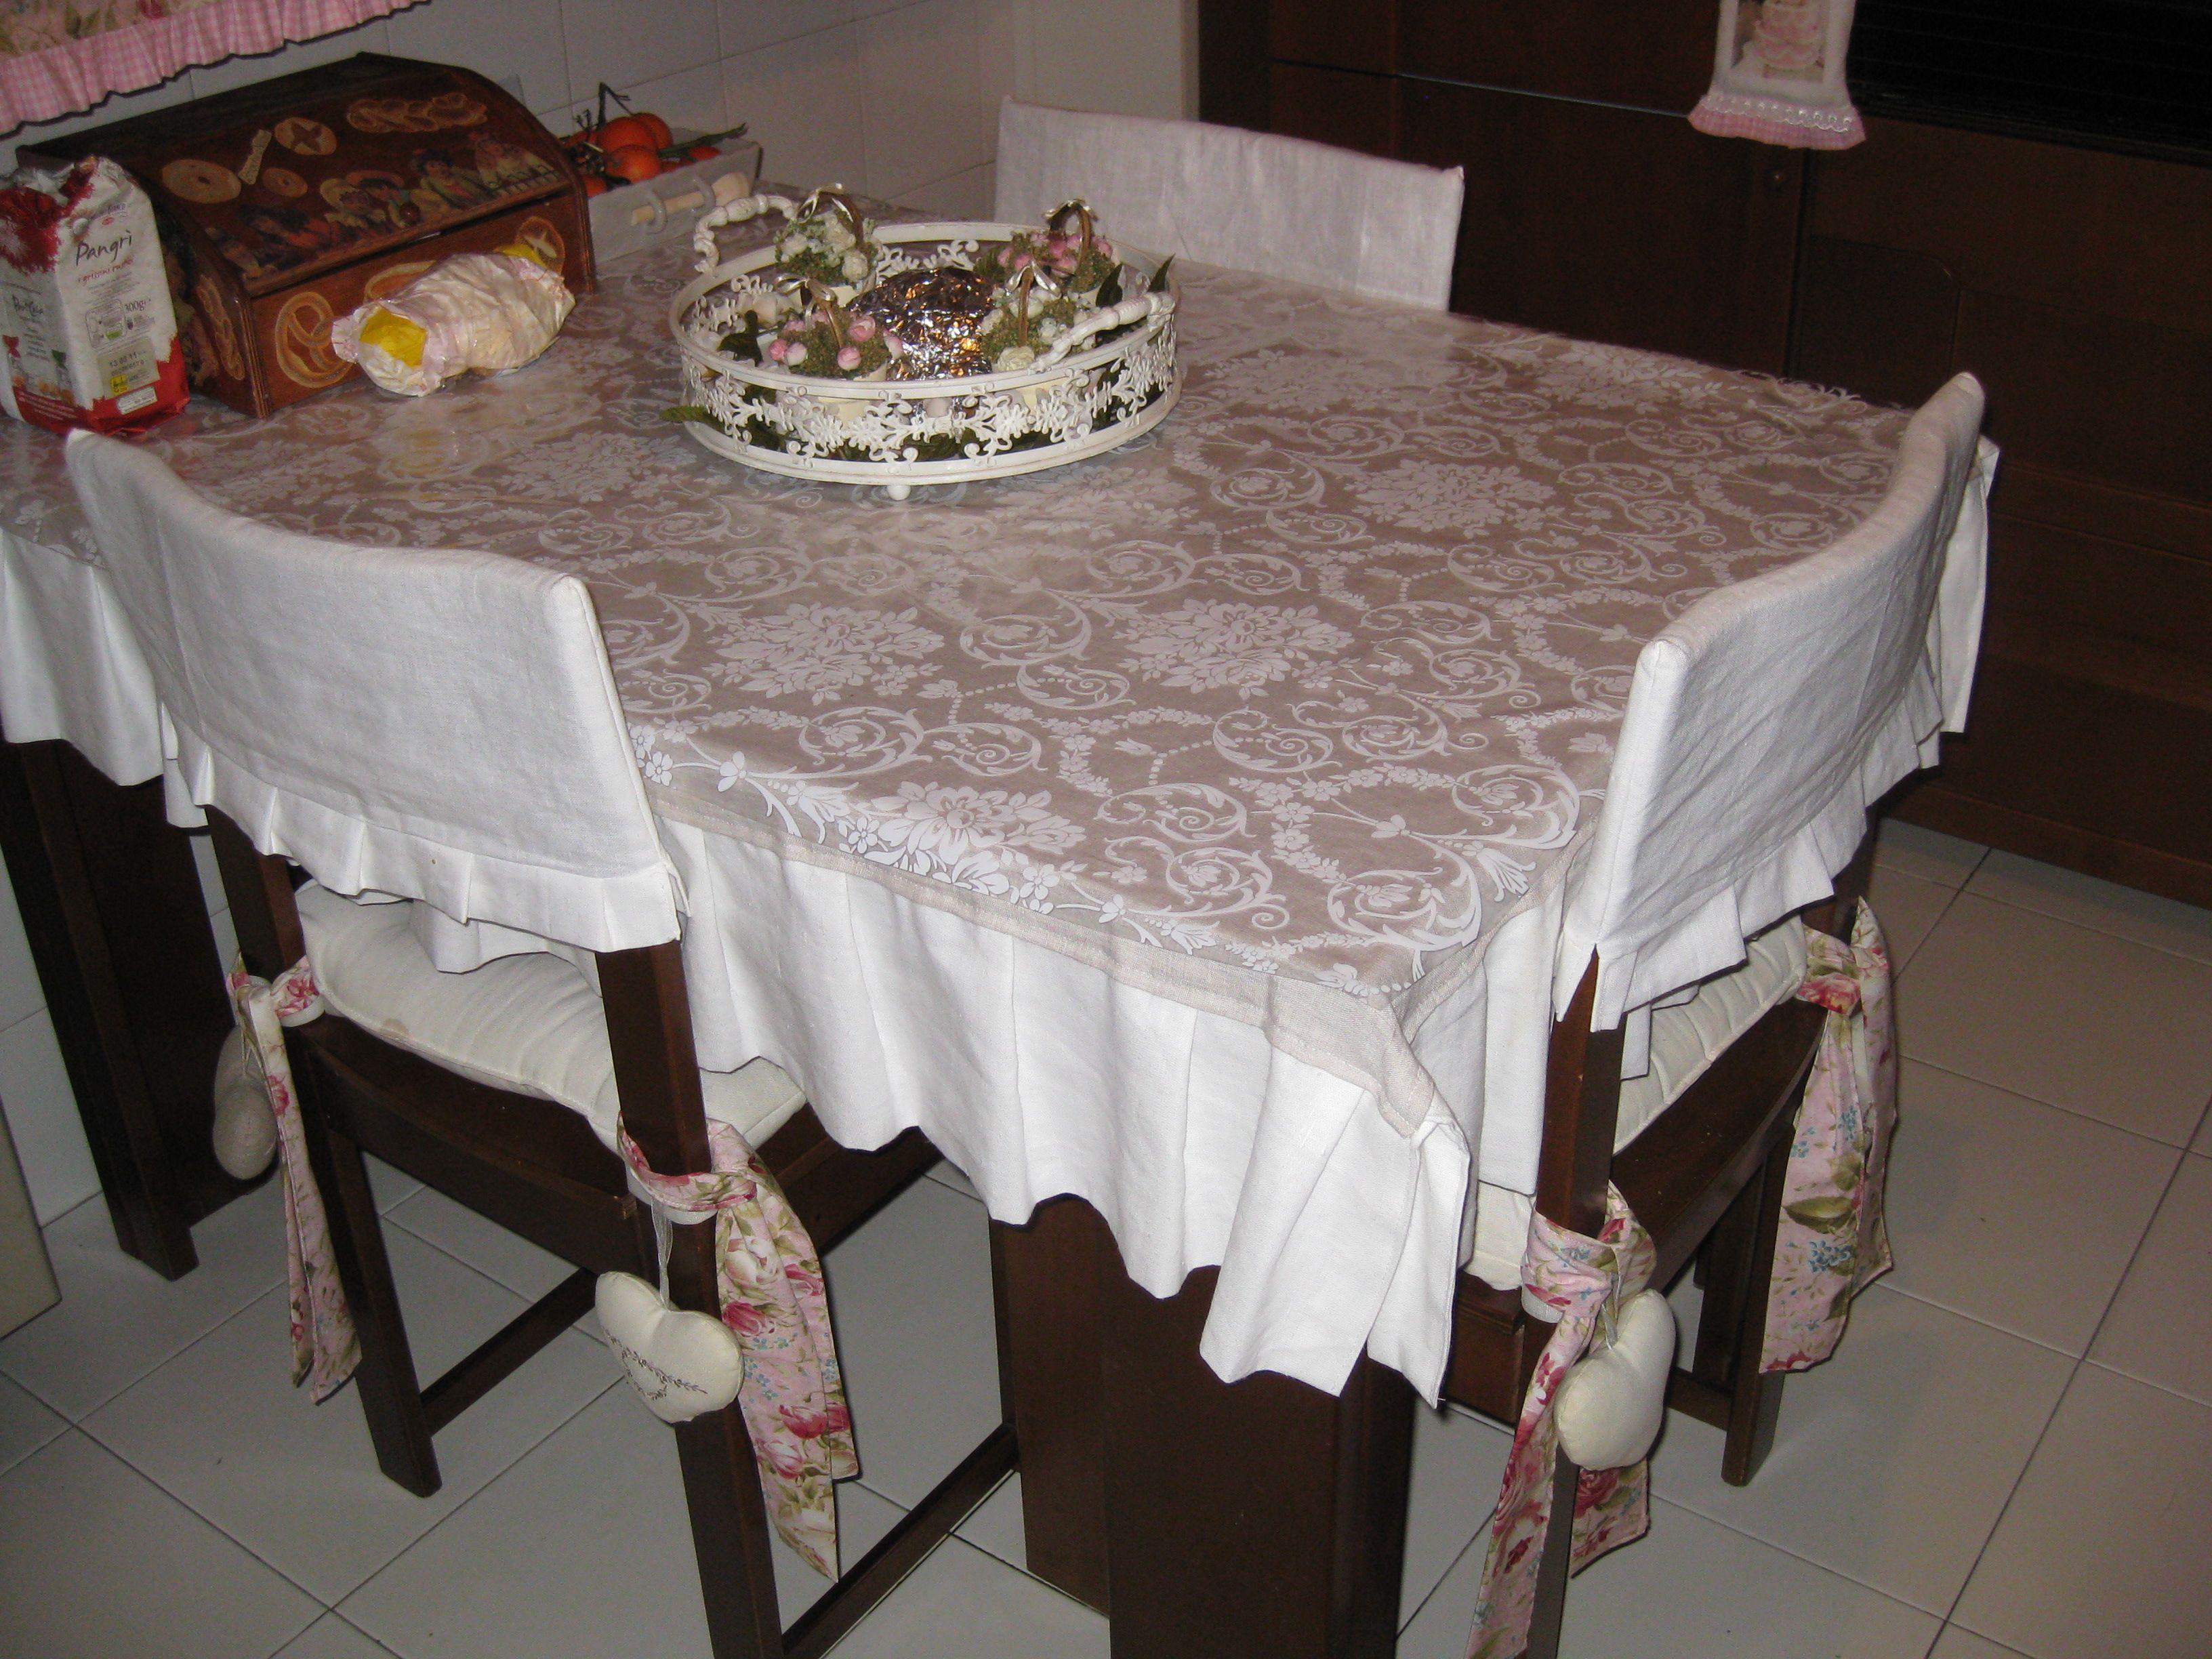 Fantasmini Sedie ~ Cartamodello coprisedia anna mari pinterest copri sedia